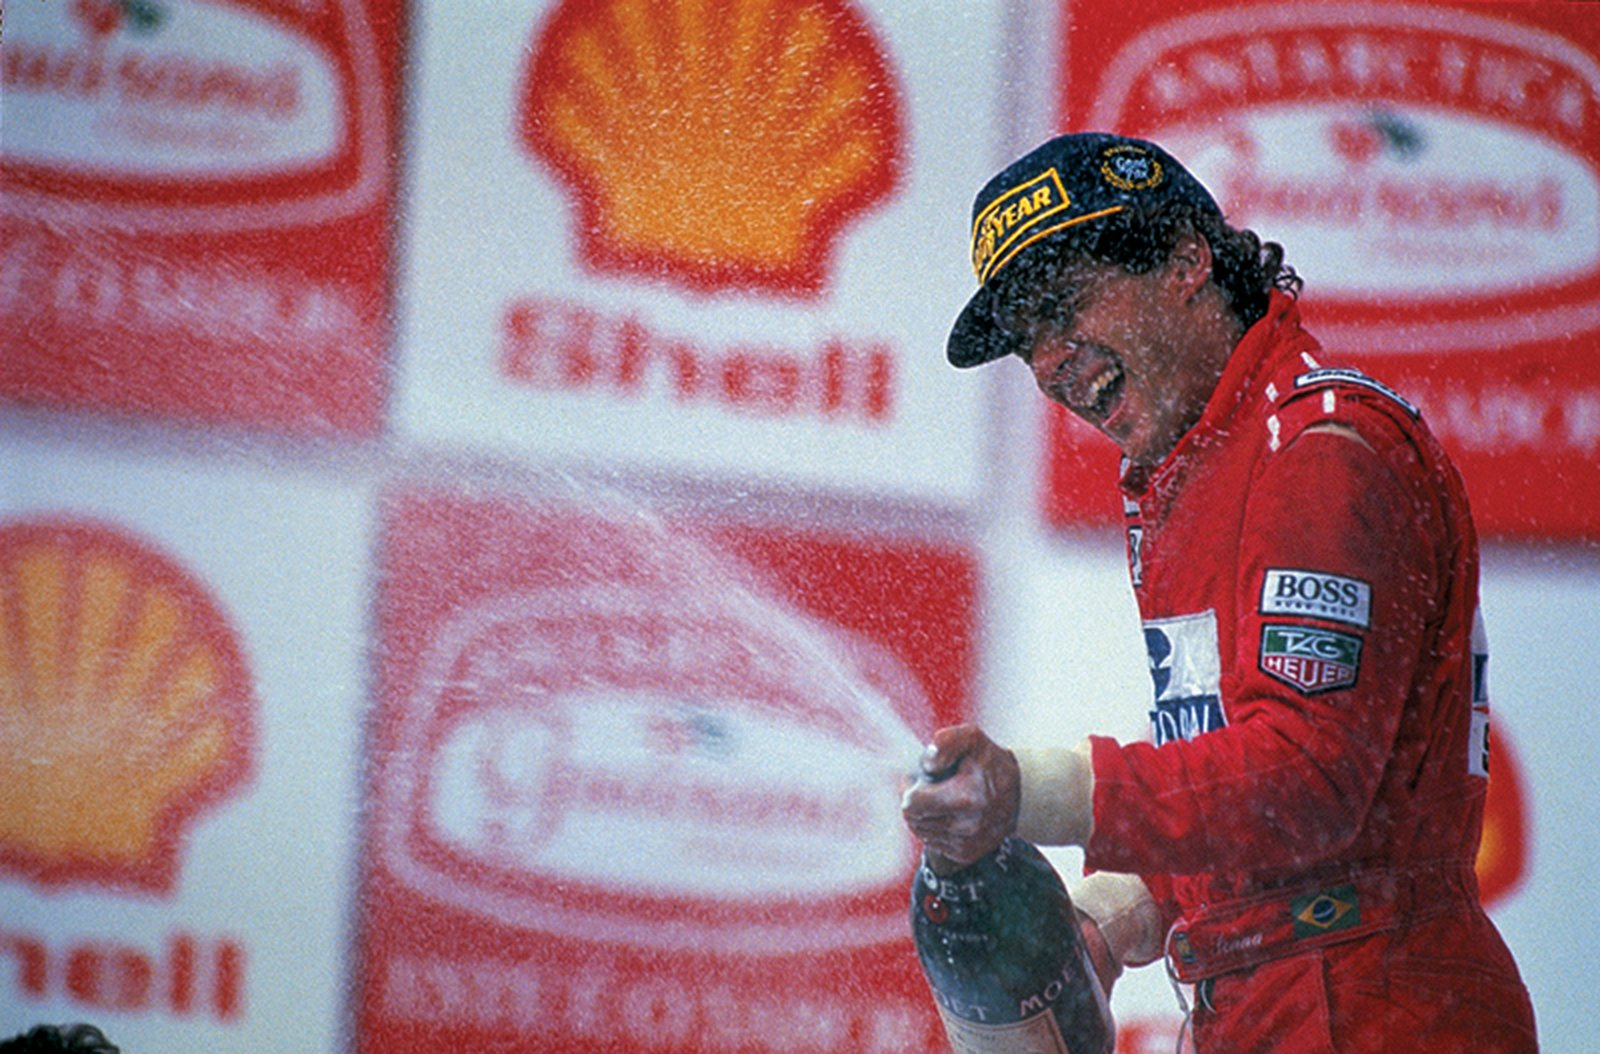 TAG Heuer Ayrton Senna